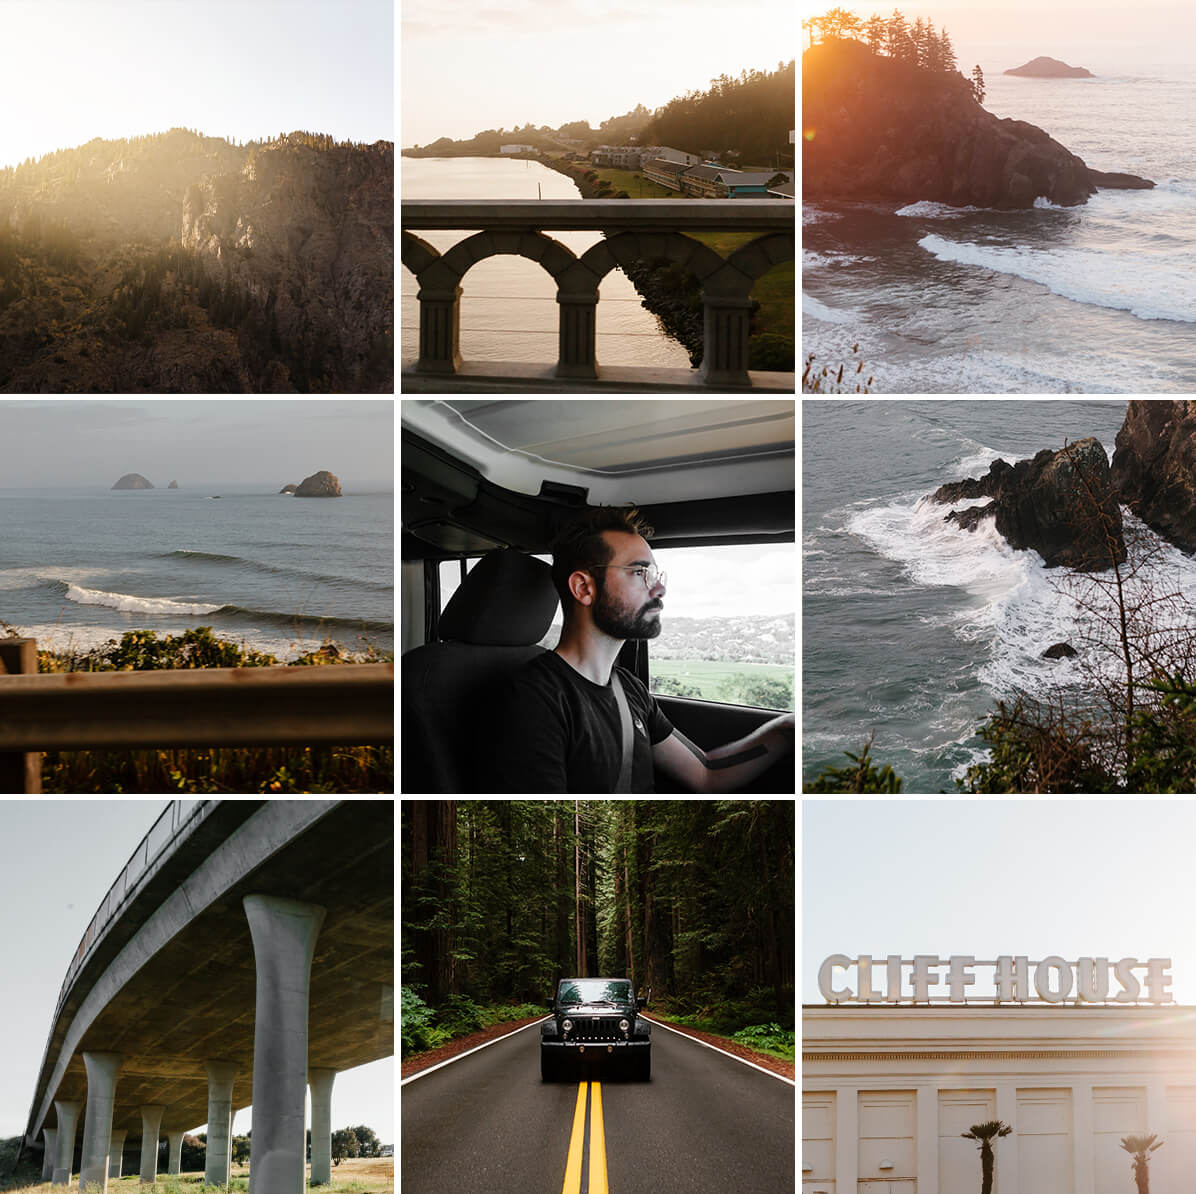 Grid of road trip photos by Brandon Lopez